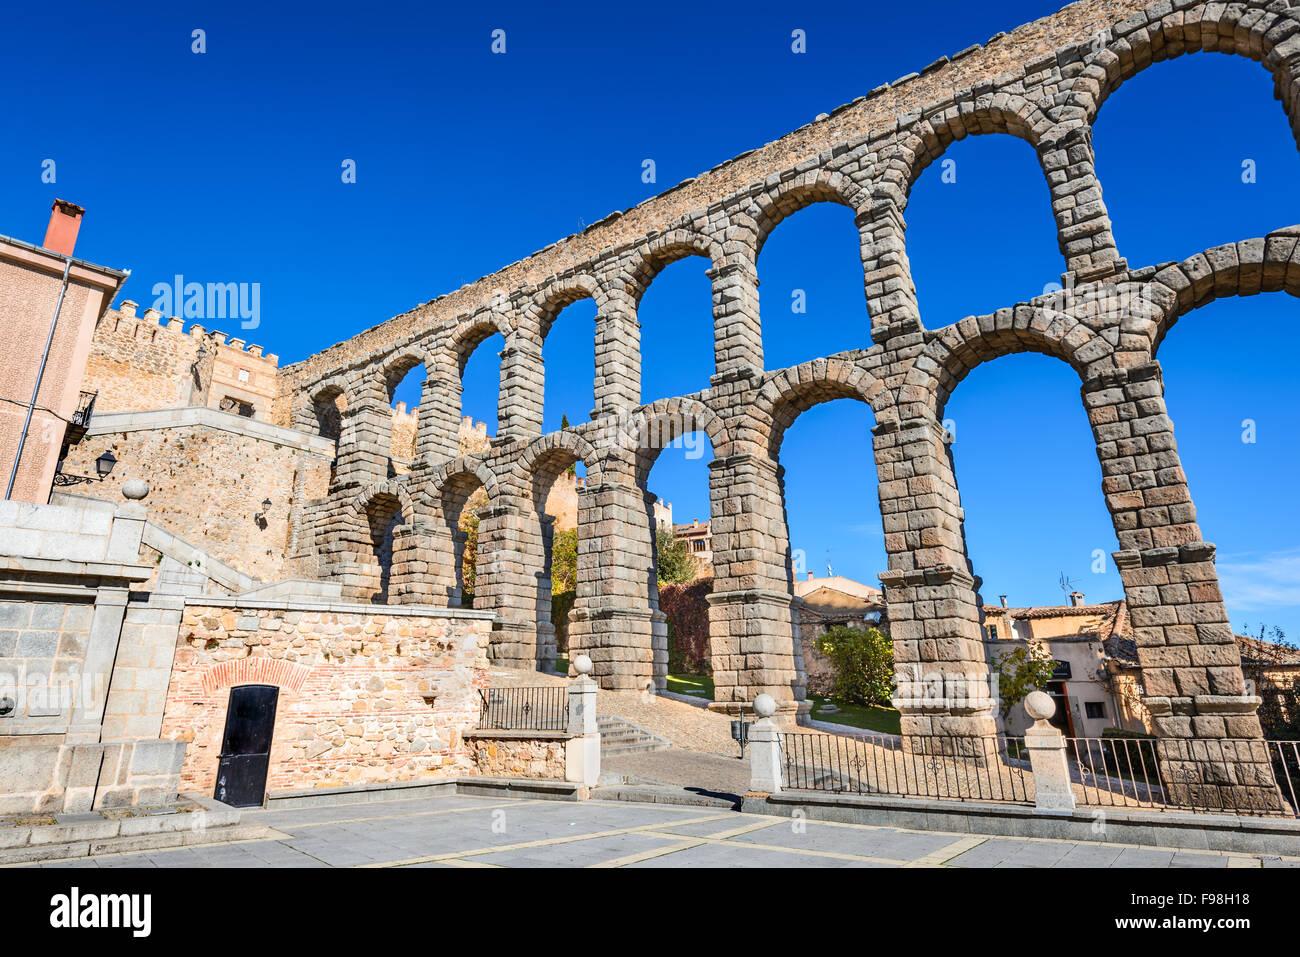 Segovia, Castilla y Leon. Roman aqueduct bridge of Segovia in Castile, Spain. - Stock Image